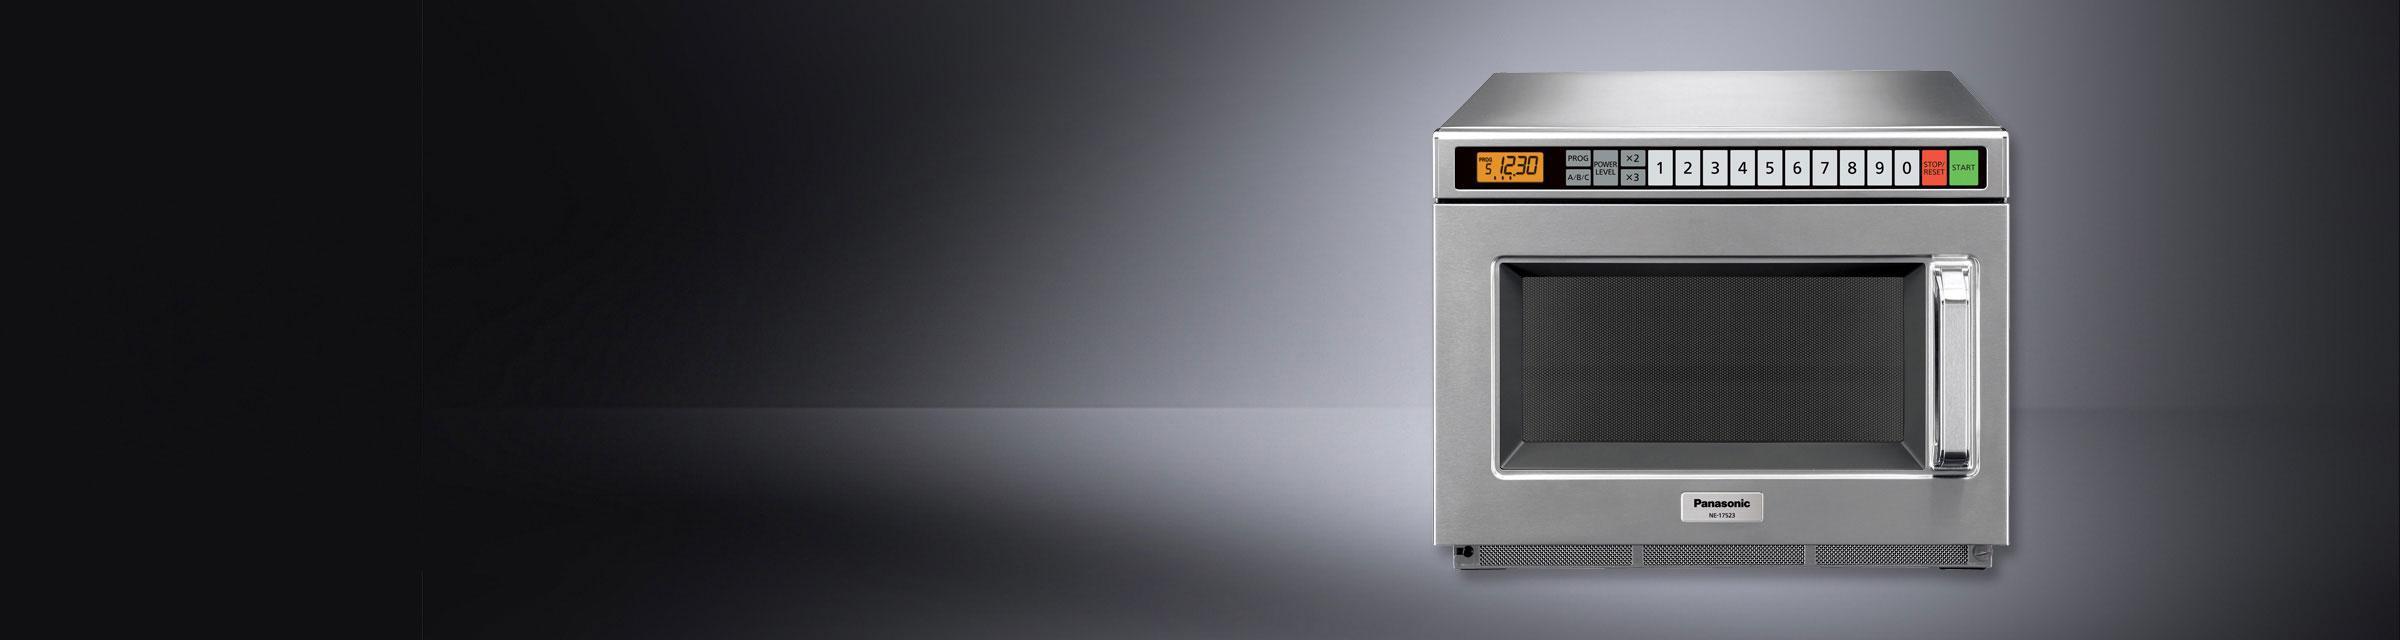 Heavy Duty Microwaves Panasonic North